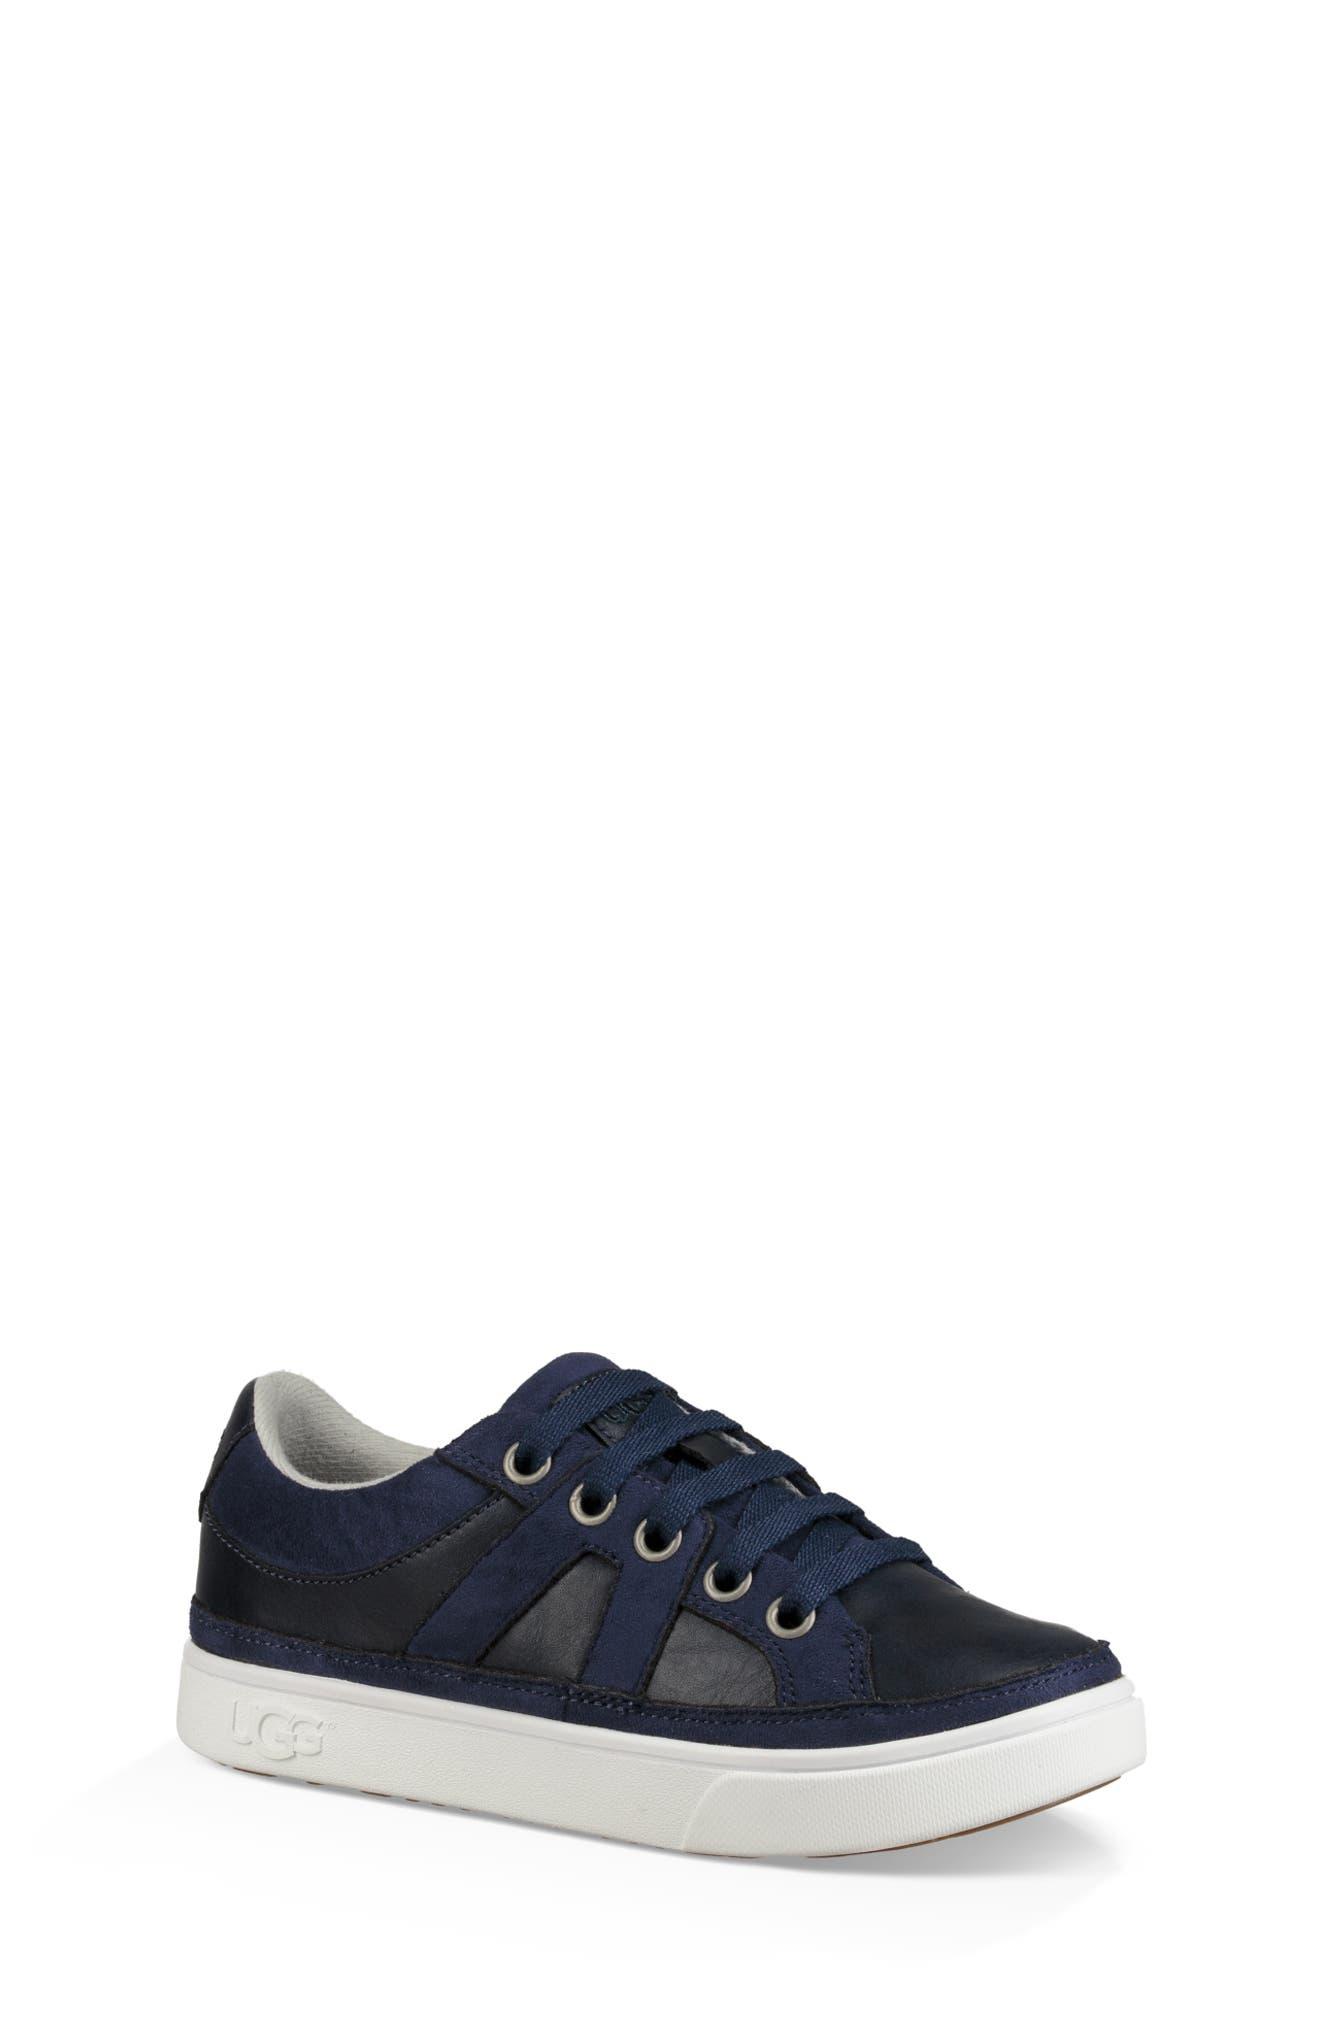 Marcus Sneaker,                             Main thumbnail 1, color,                             NAVY